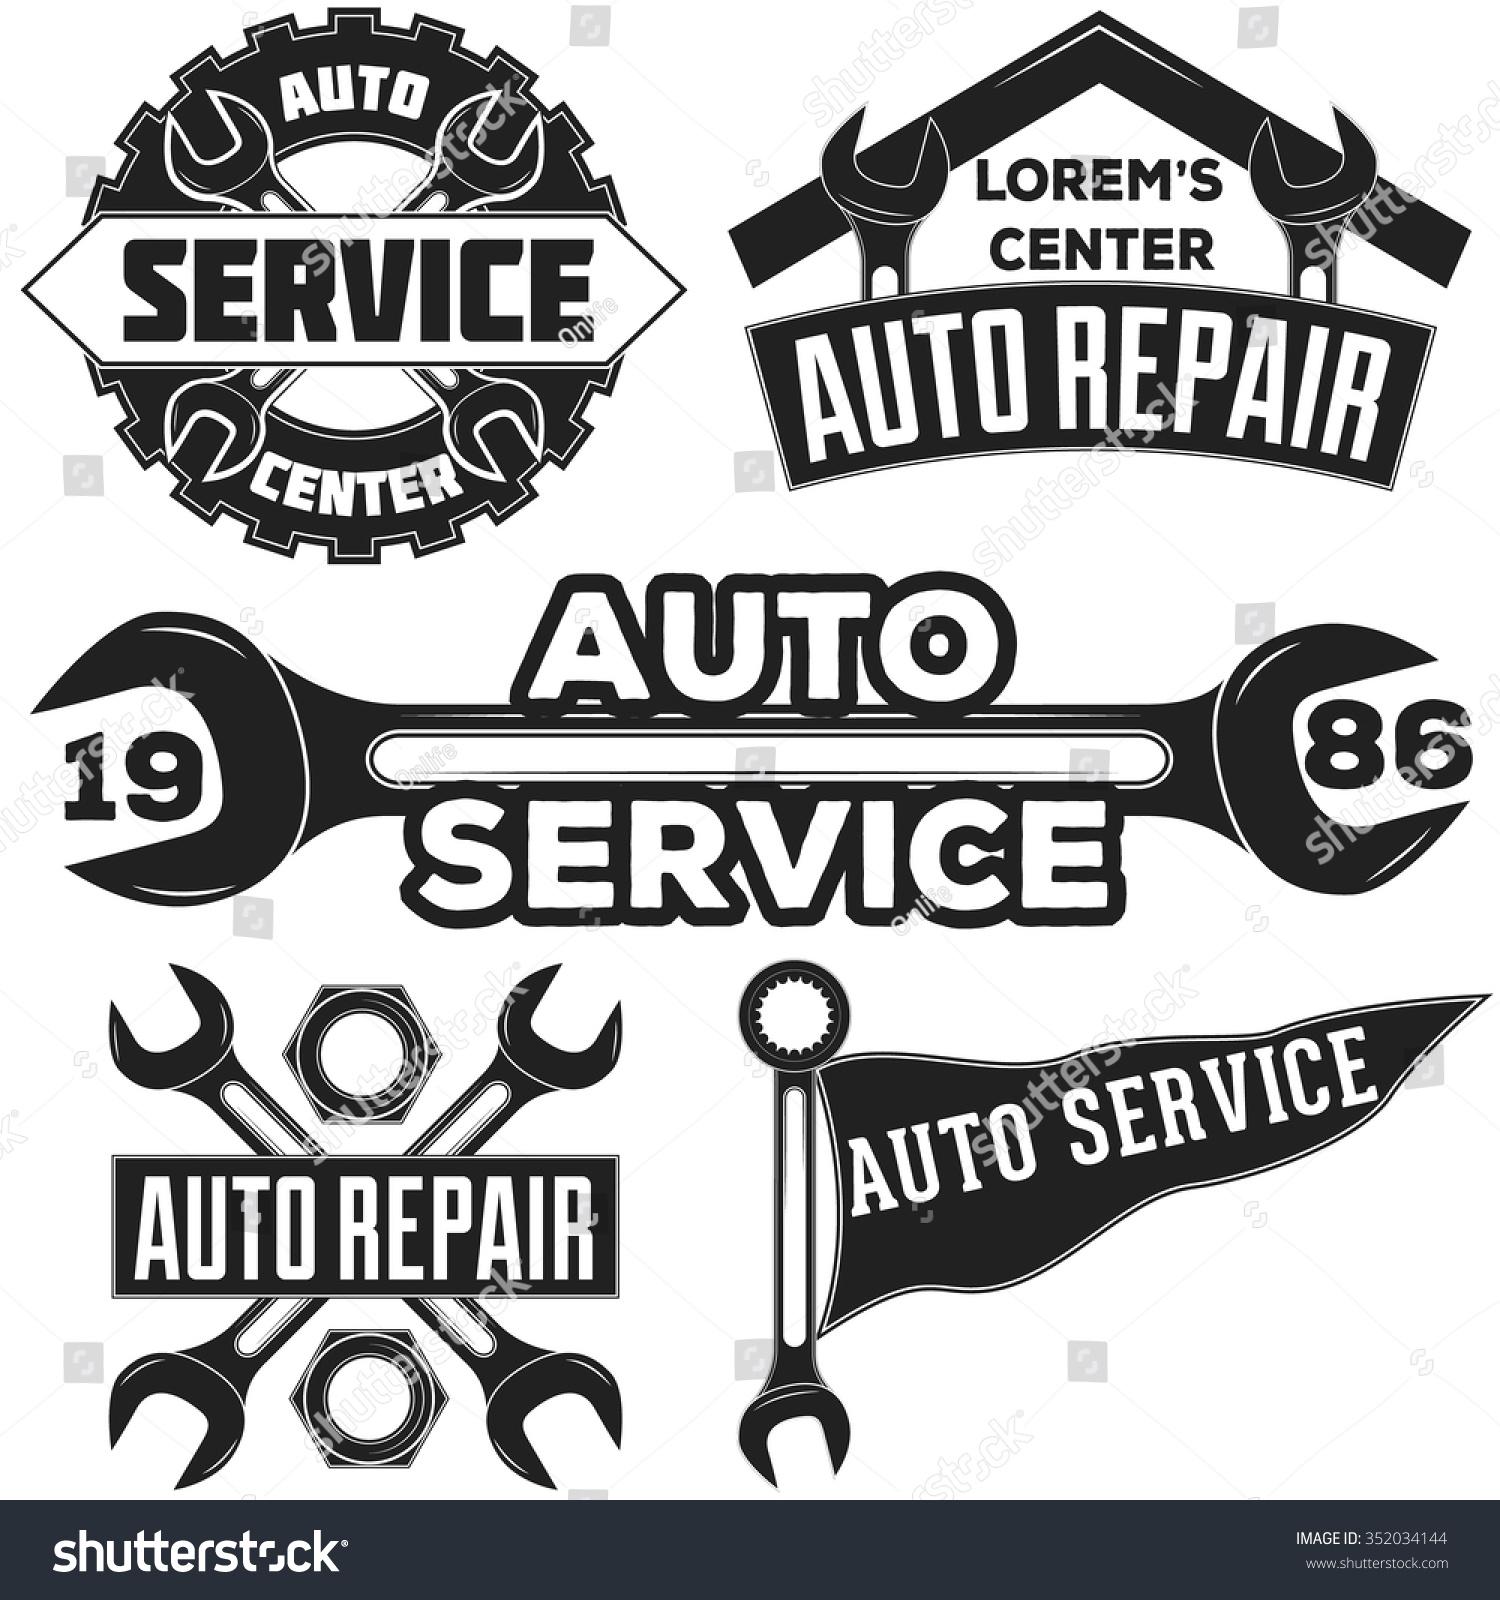 Royalty Free Vintage Mechanic Auto Service Repair 352034144 Stock